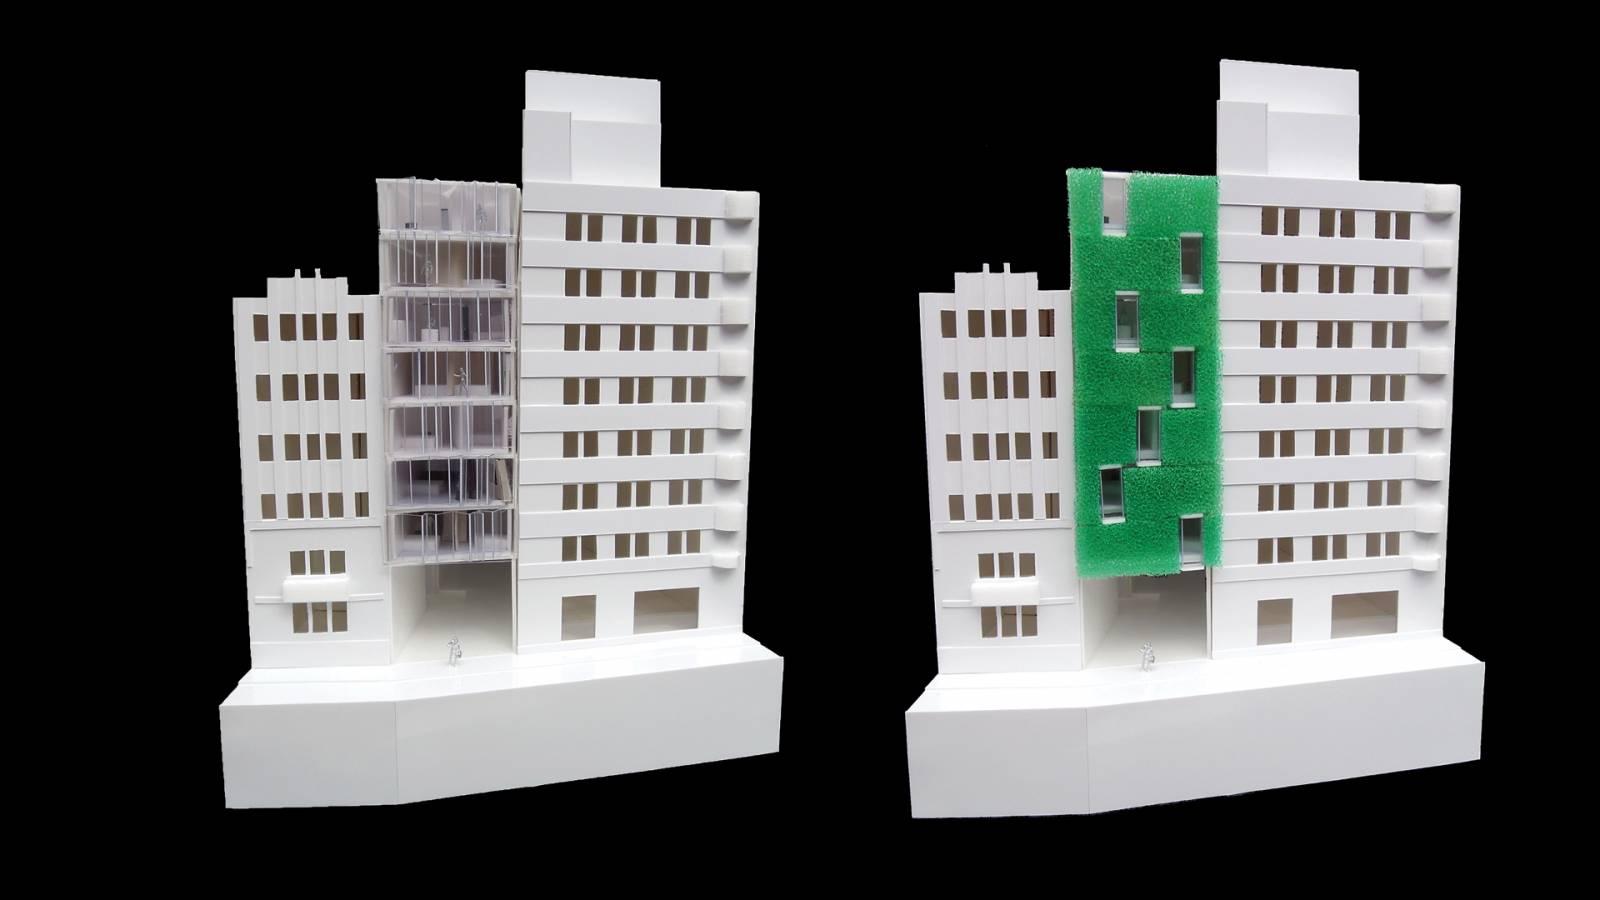 FACADE PROPOSAL  - MODELS - Salvador Lofts - SPOL Architects